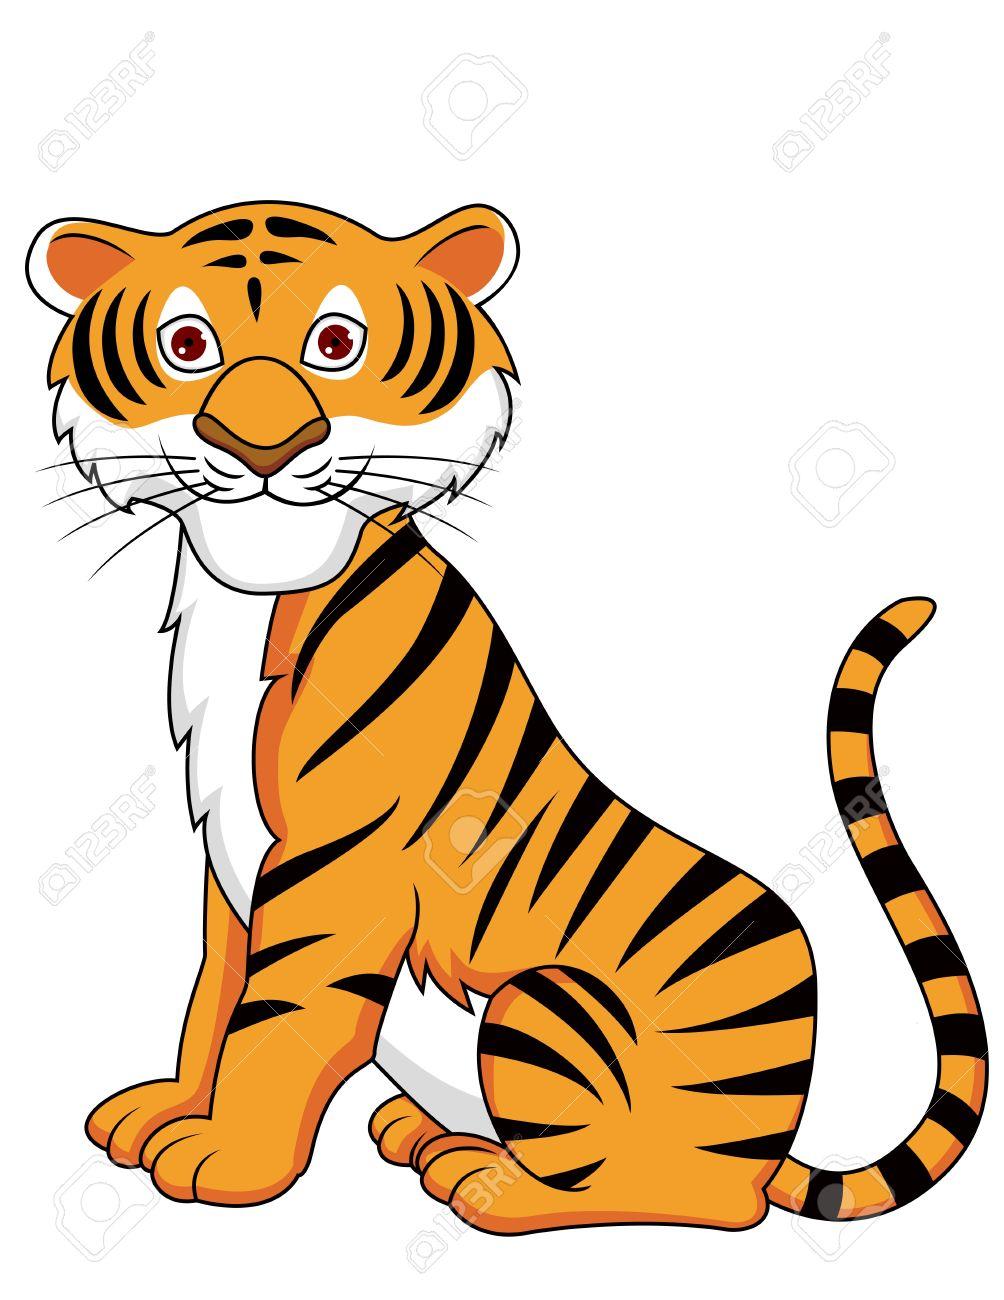 Tiger cartoon Stock Vector - 13446433